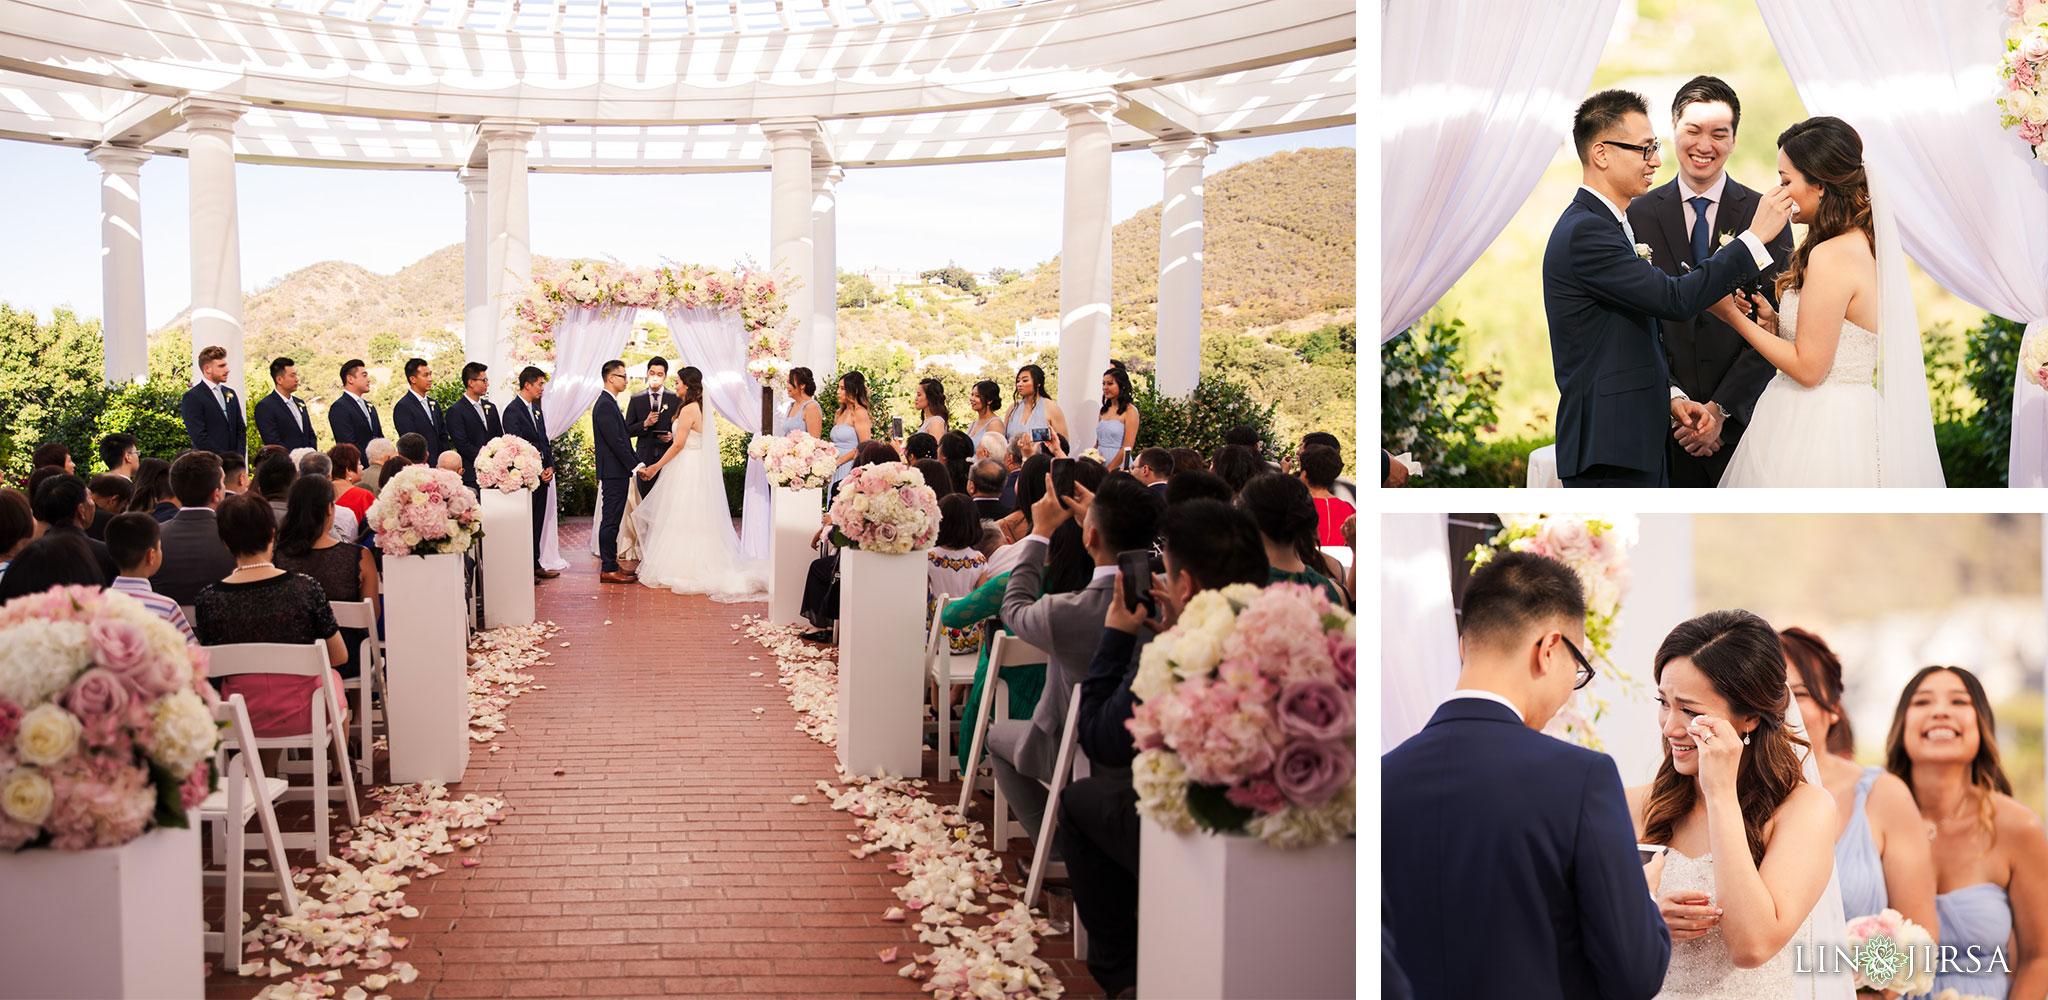 023 sherwood country club ventura county wedding ceremony photography